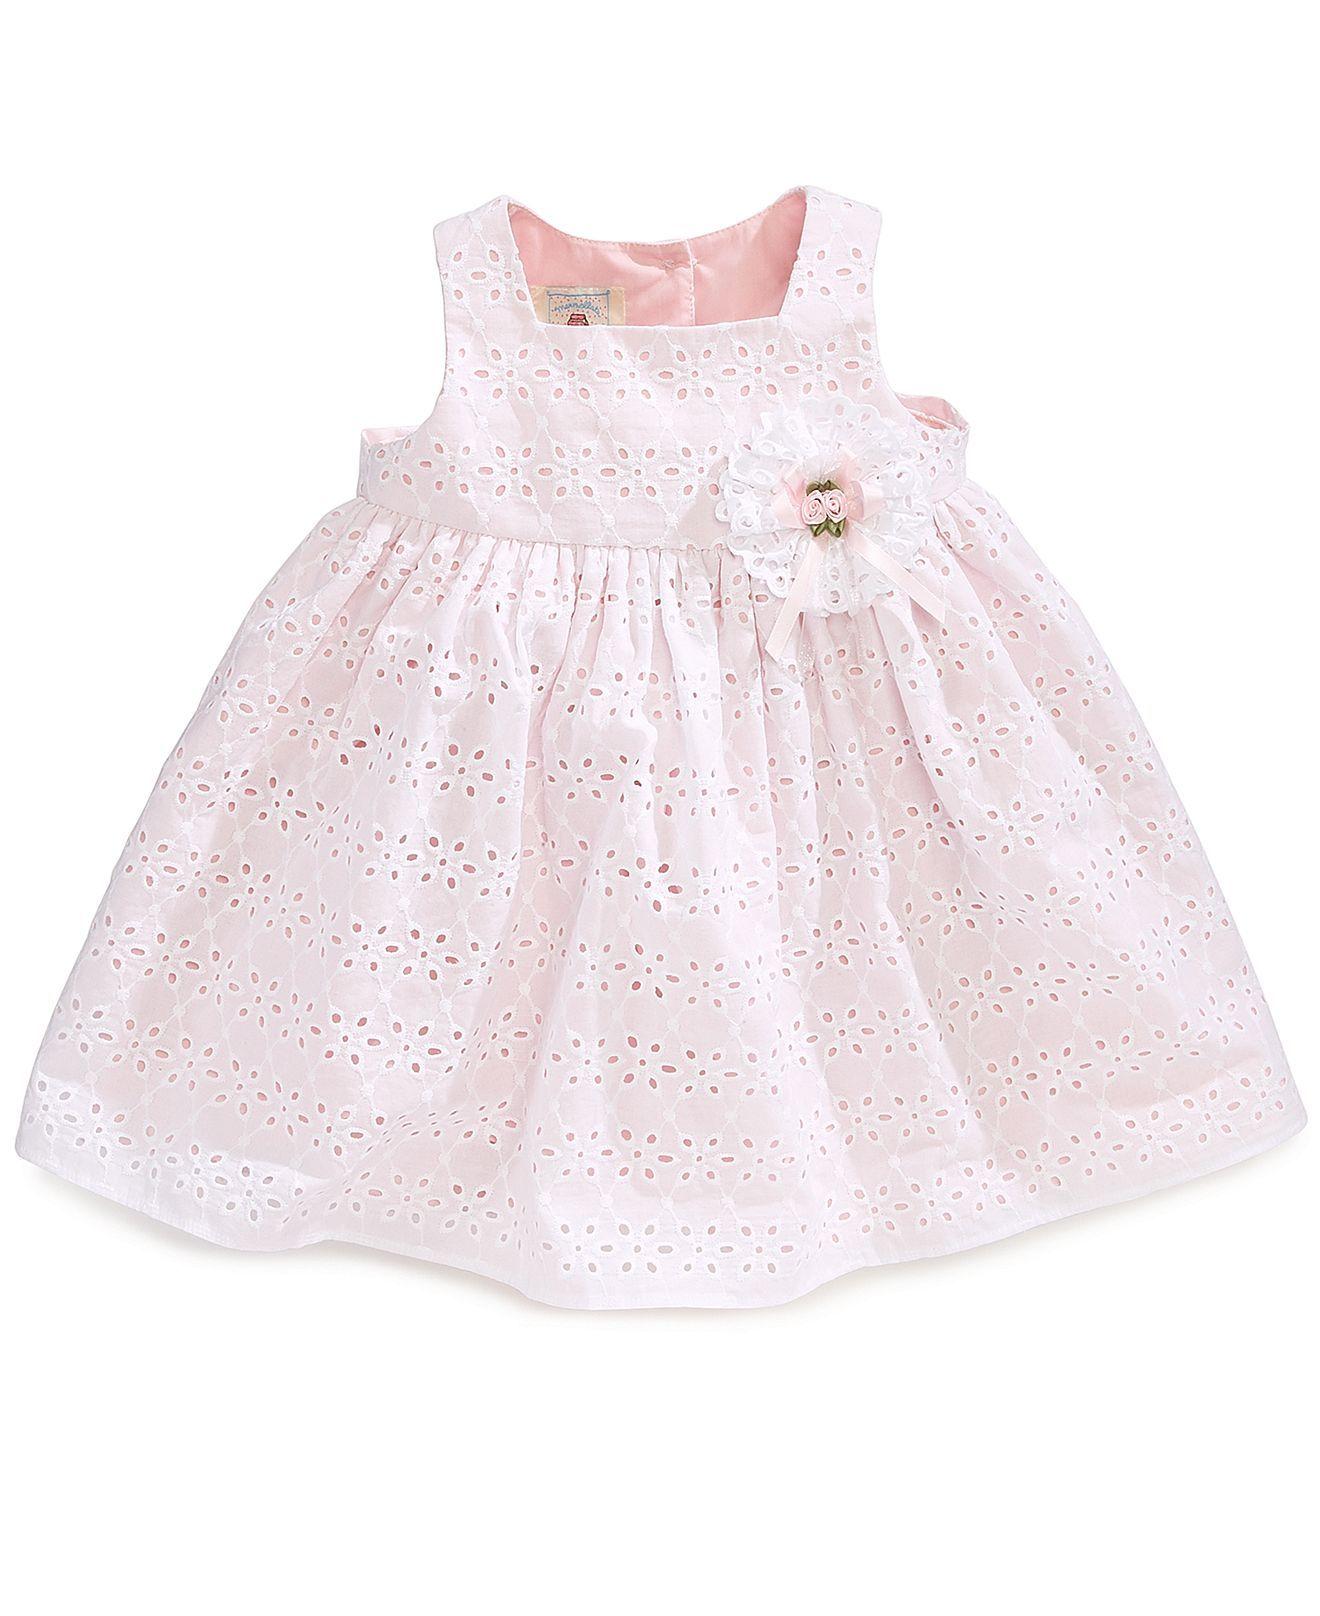 Marmellata Baby Girls Eyelet Floral Dress Kids Dresses